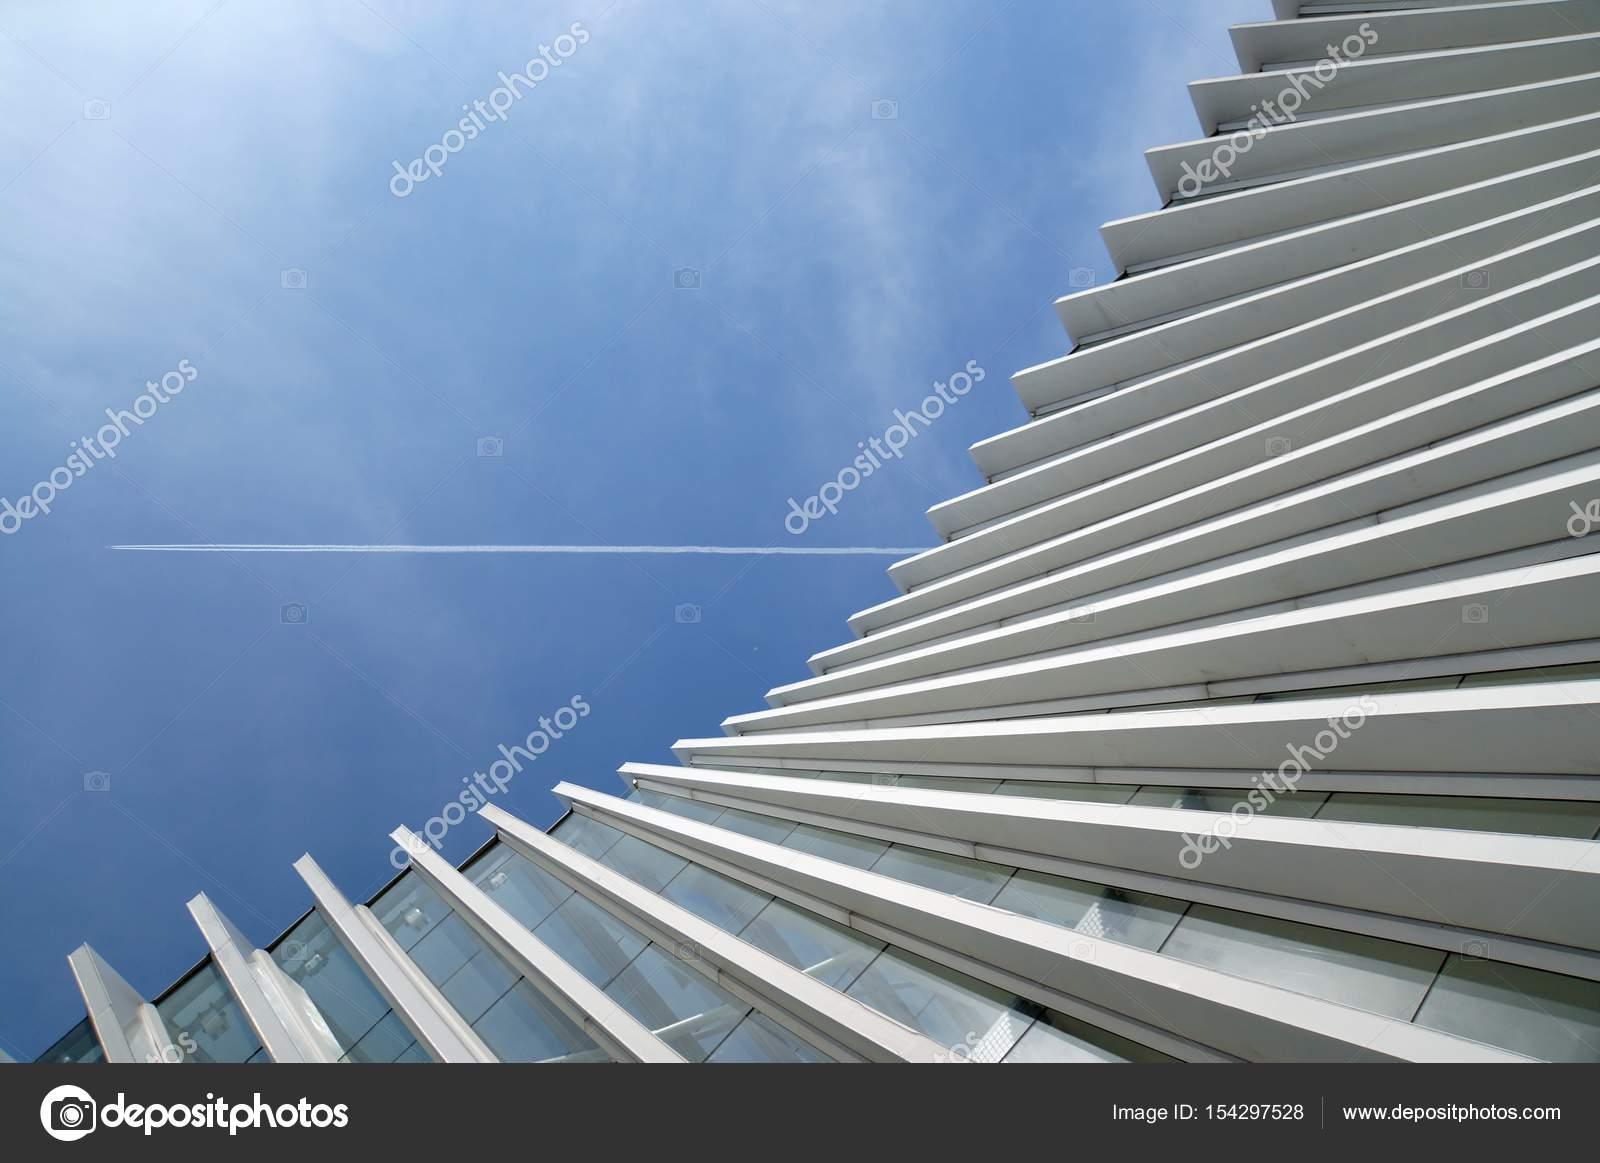 Architektura Světlo A Prostor V Reggio Emilia Itálie Stock